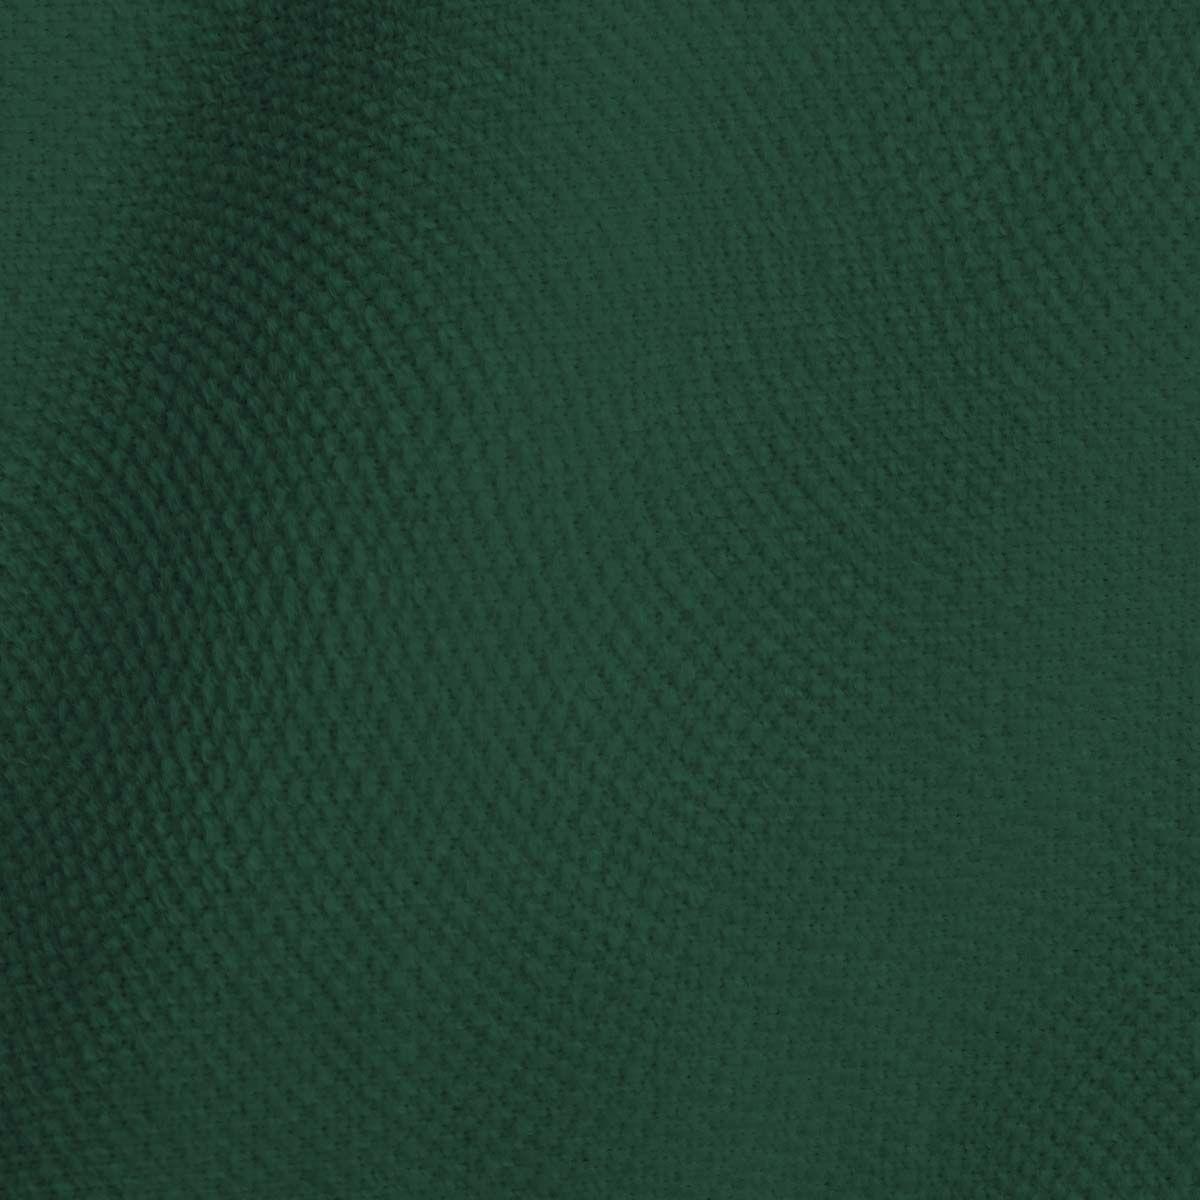 Rideau en velours vert sapin Leros 140x260cm